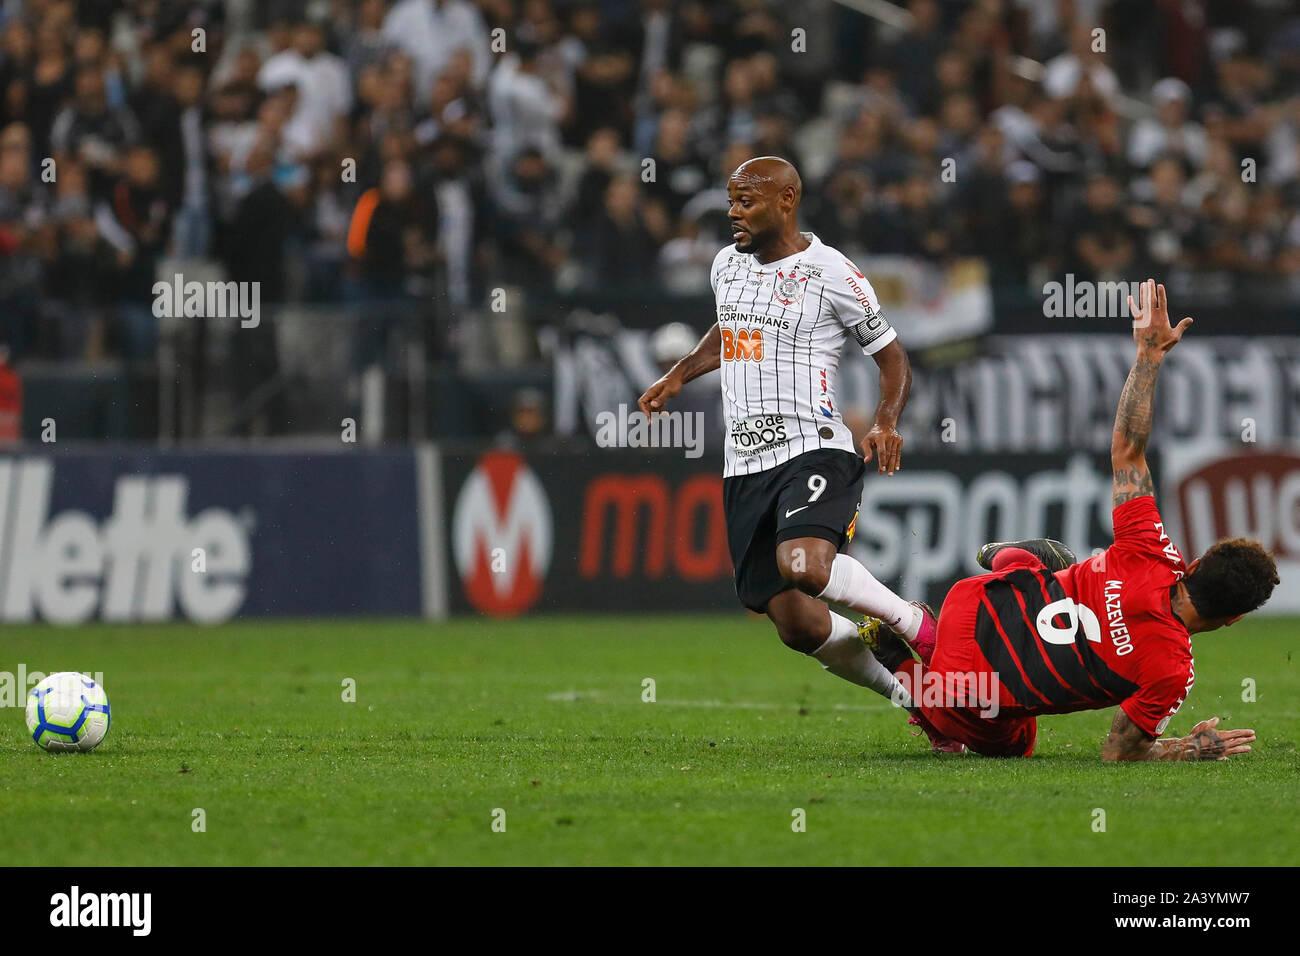 Sao Paulo Sp 10 10 2019 Corinthians X Athletico Paranaense Vagner Love And Marcio Azevedo Of Athletico